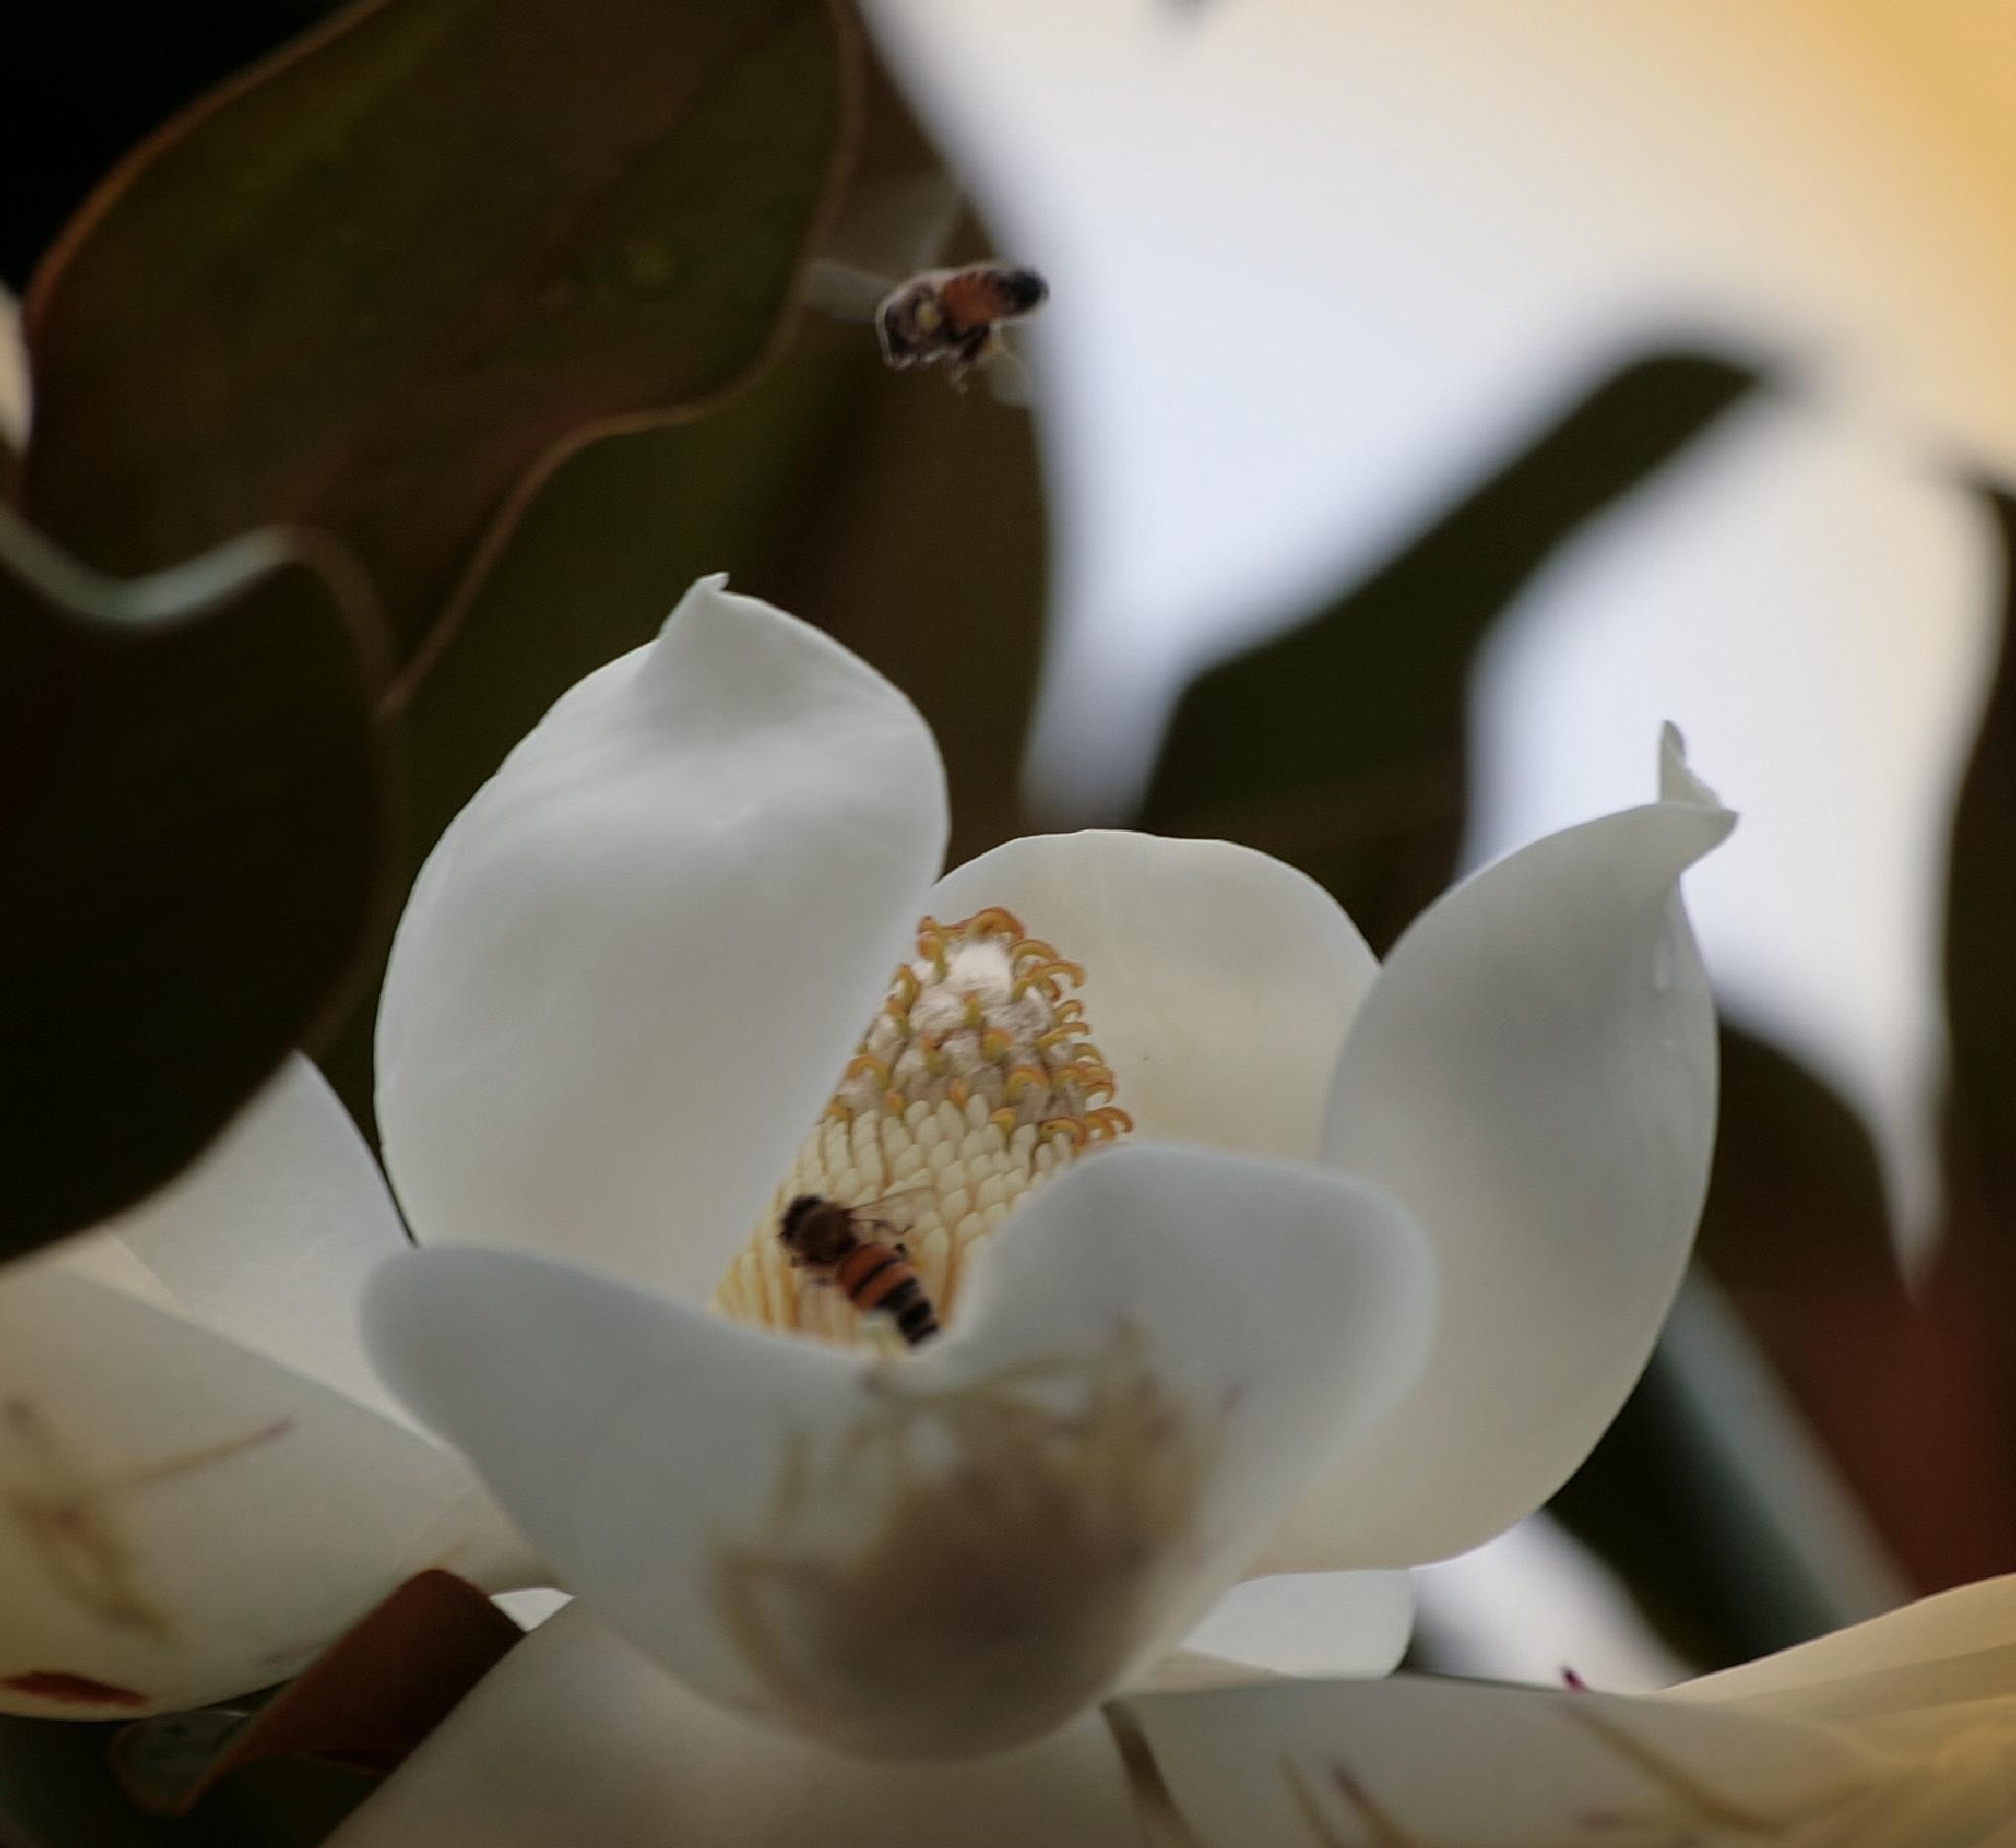 Magnolia by Doug Bottalico